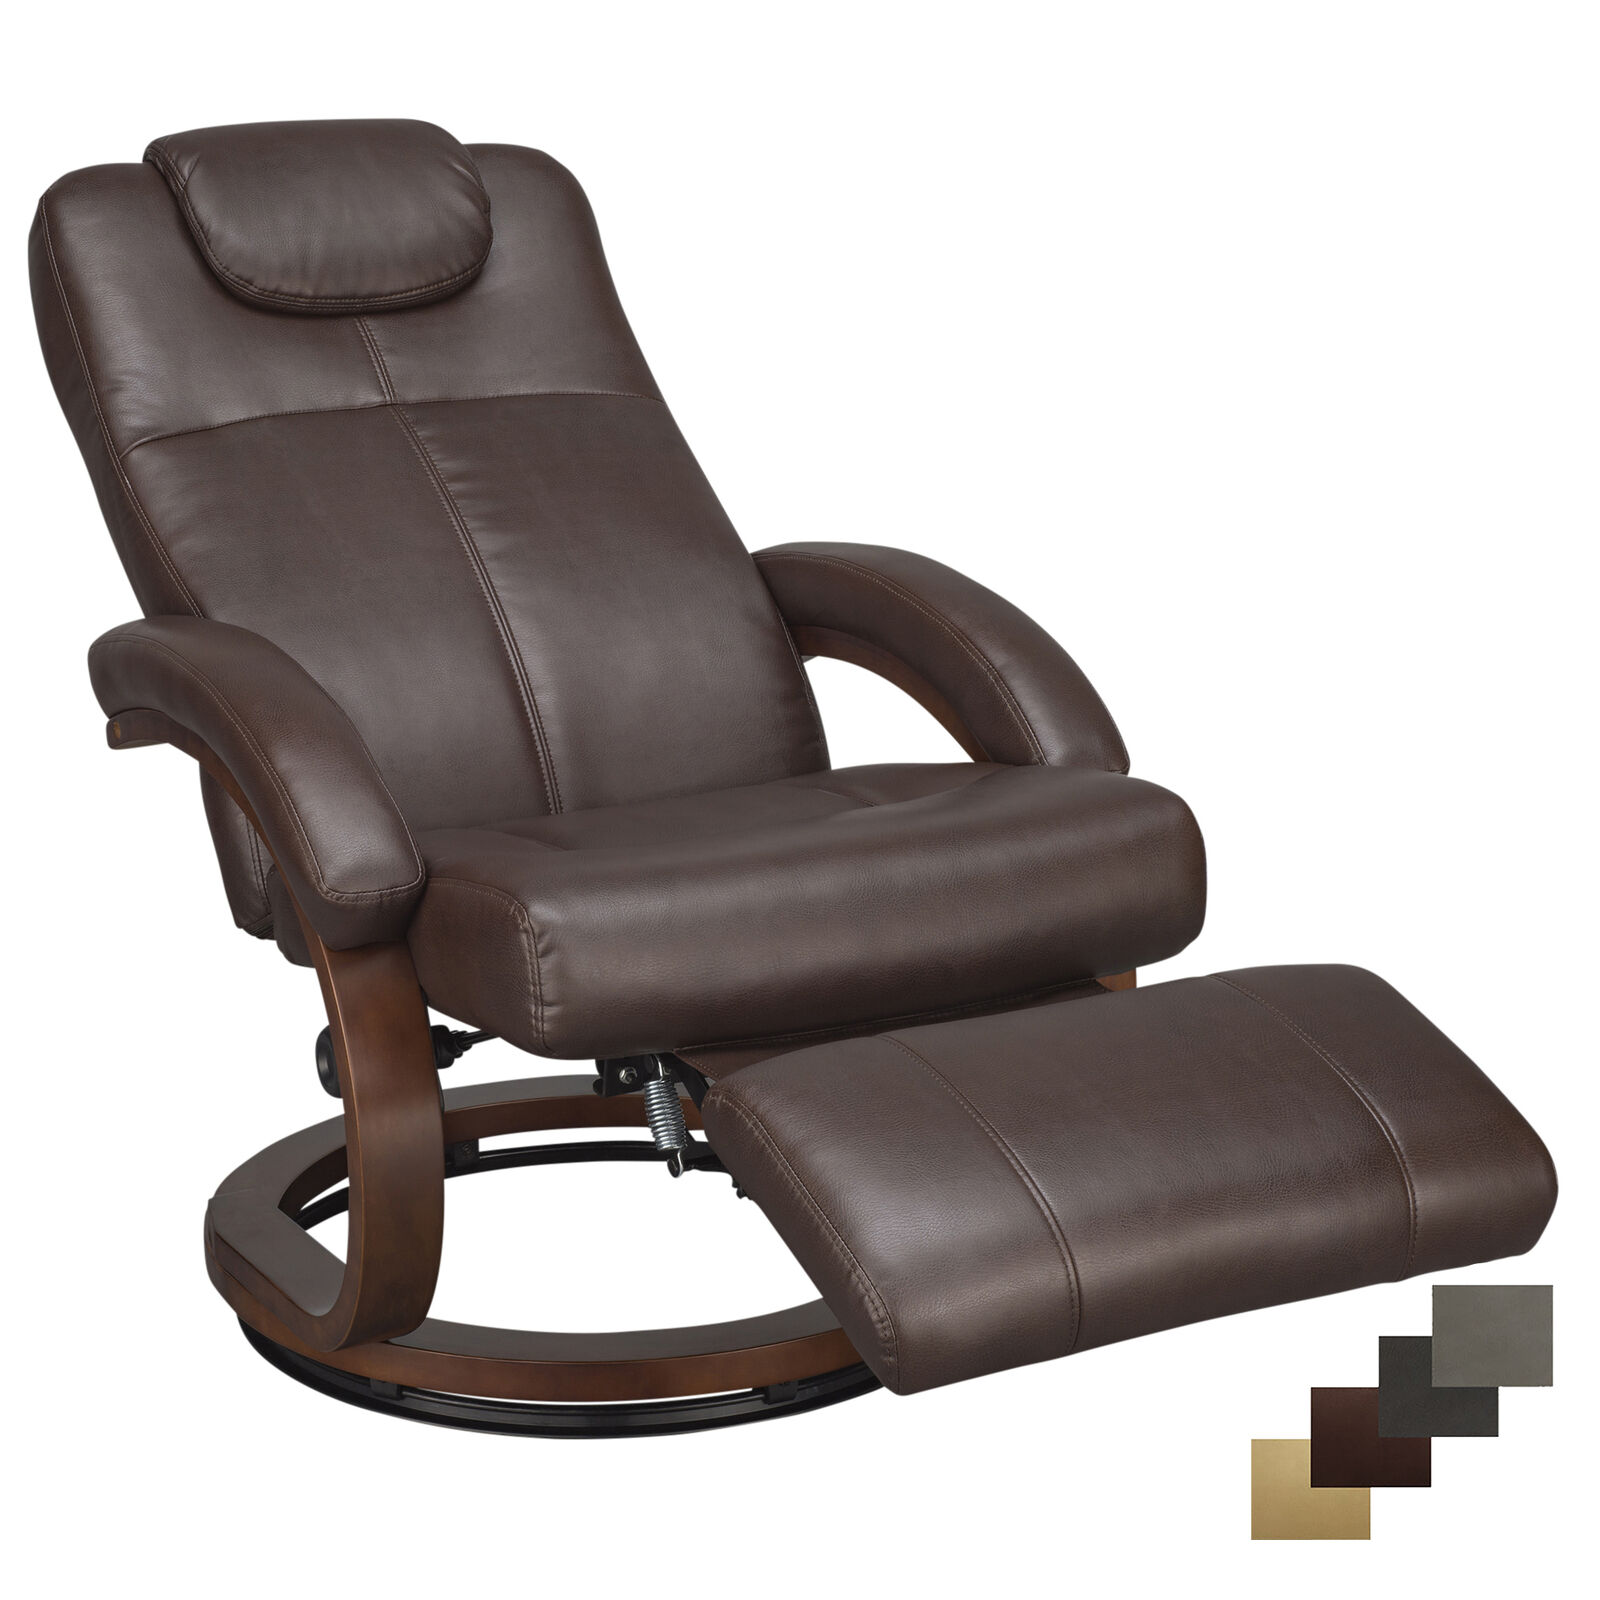 "RecPro Charles 28"" RV Euro Chair Recliner Ergonomic RV Furniture Seat Swivel"